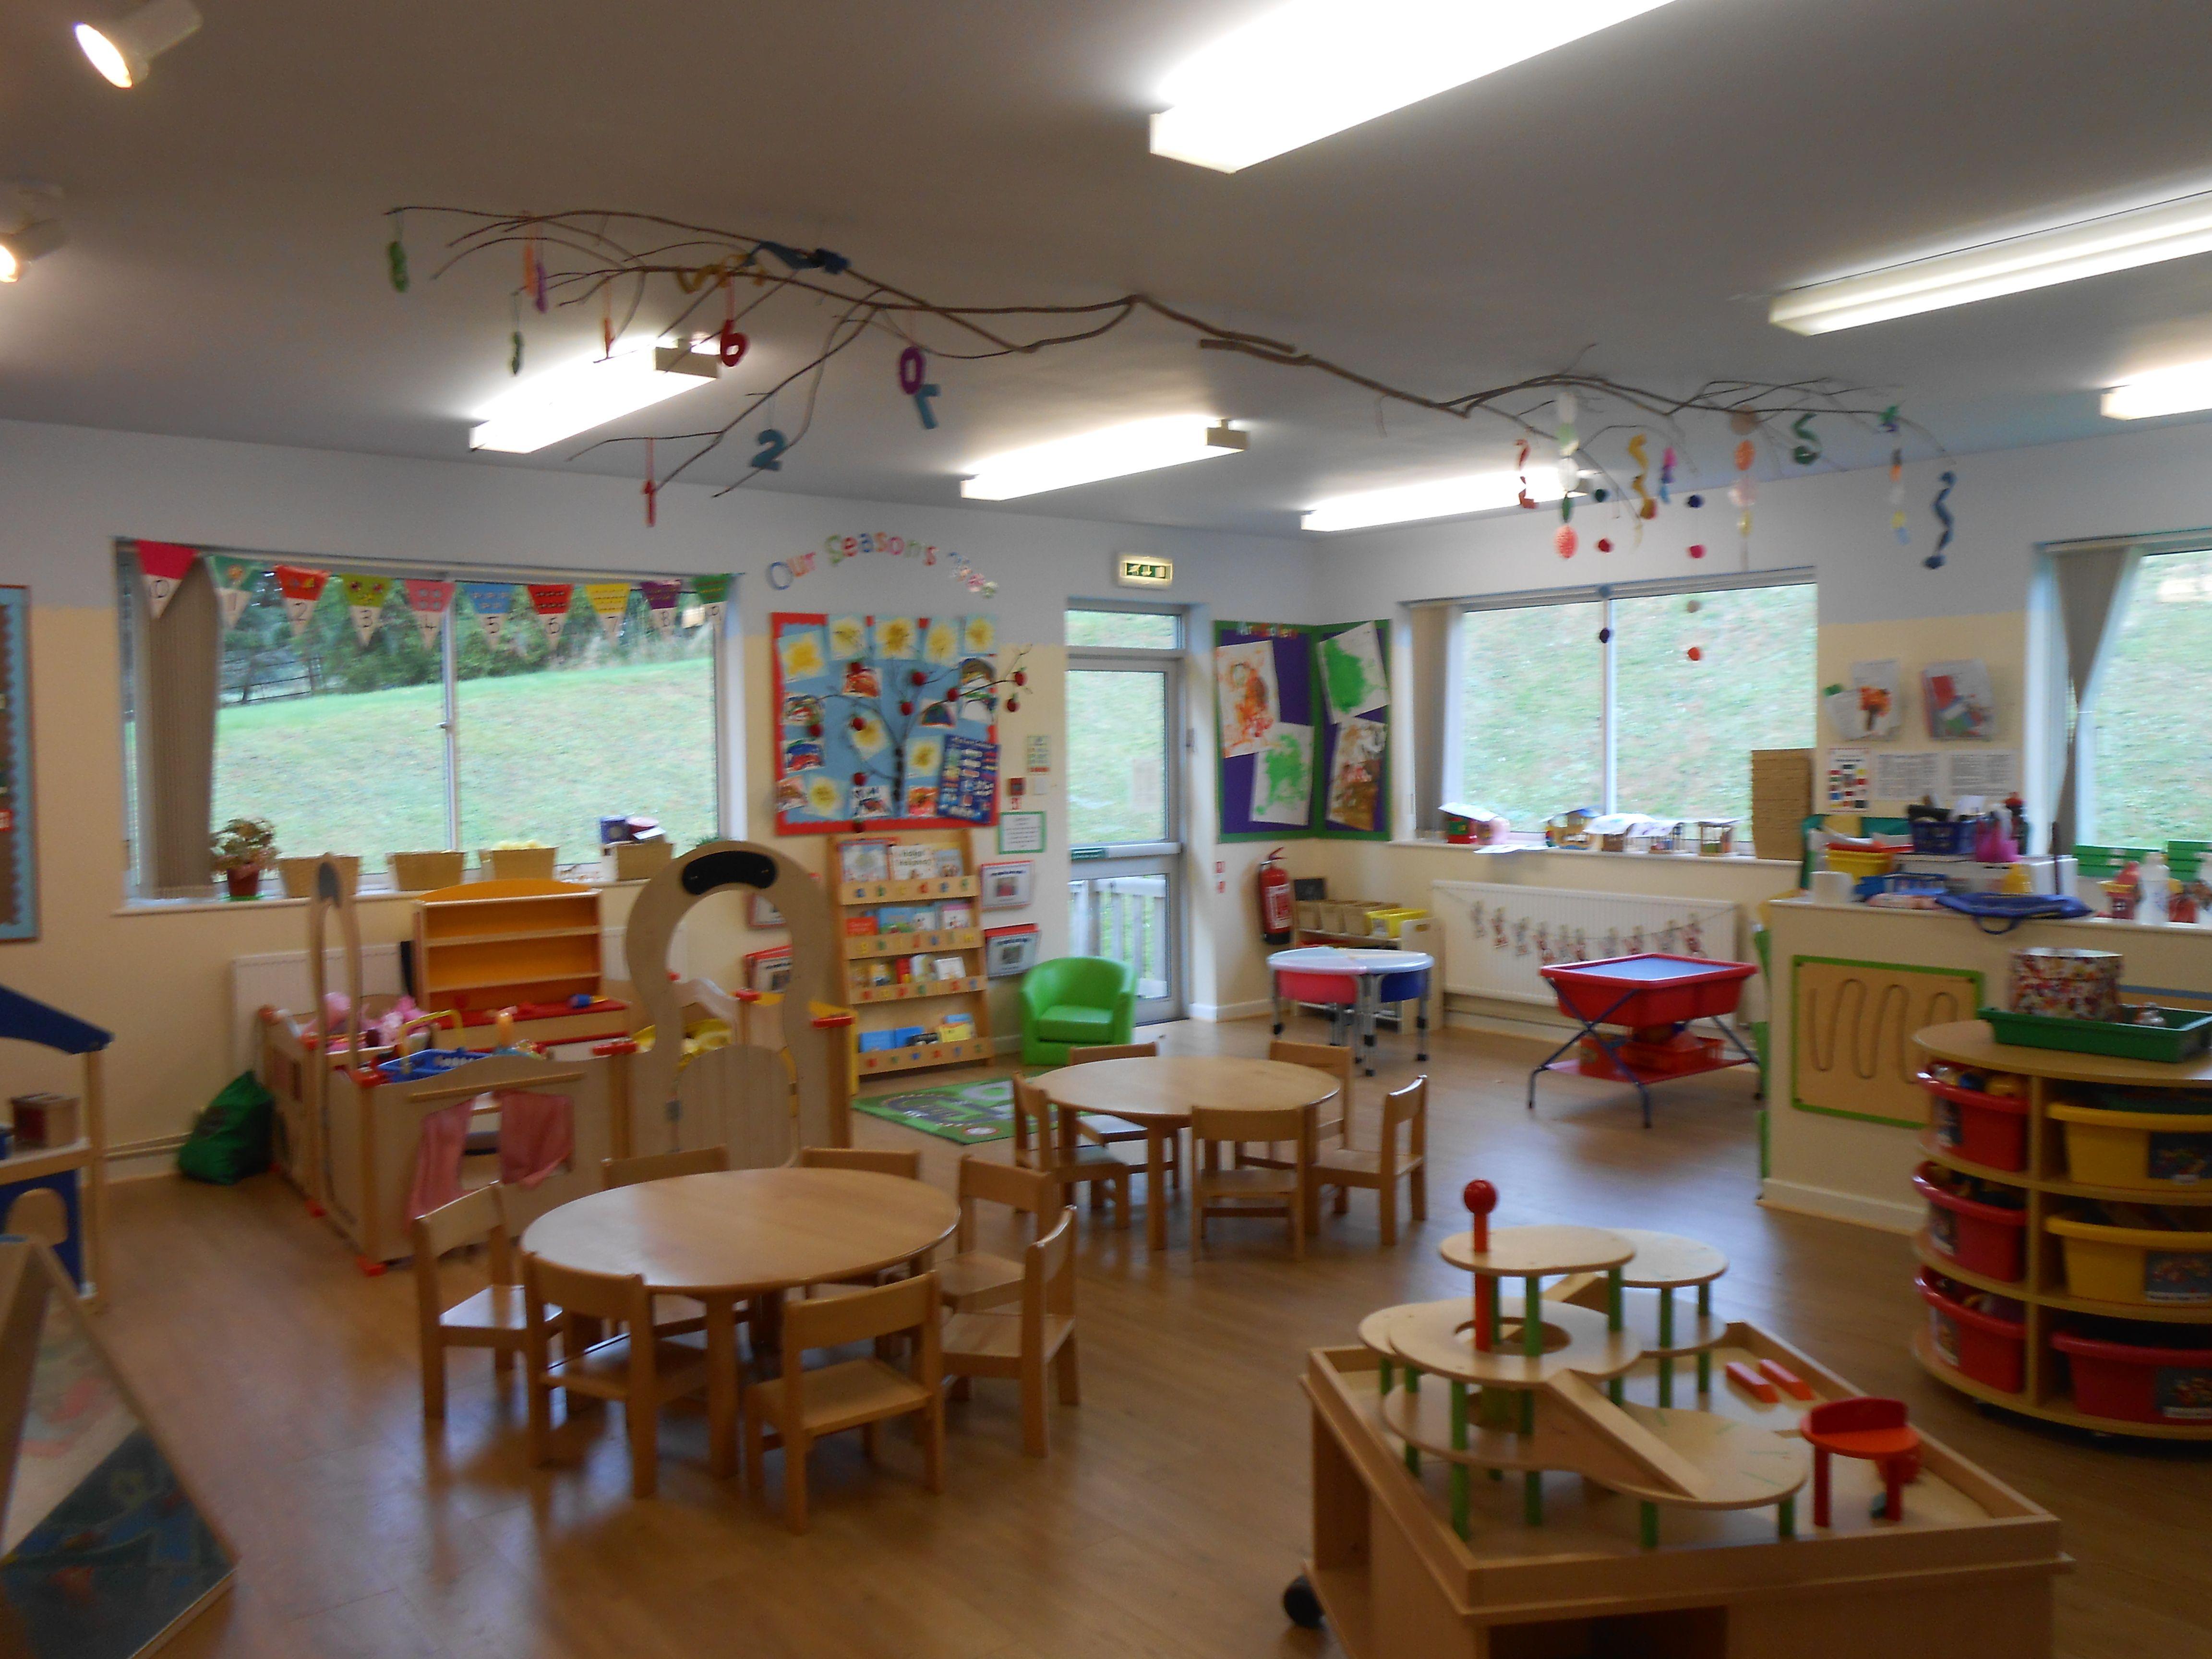 Reggio Classroom Design ~ Reggio inspired studio pinned by lynn young ≈≈ http